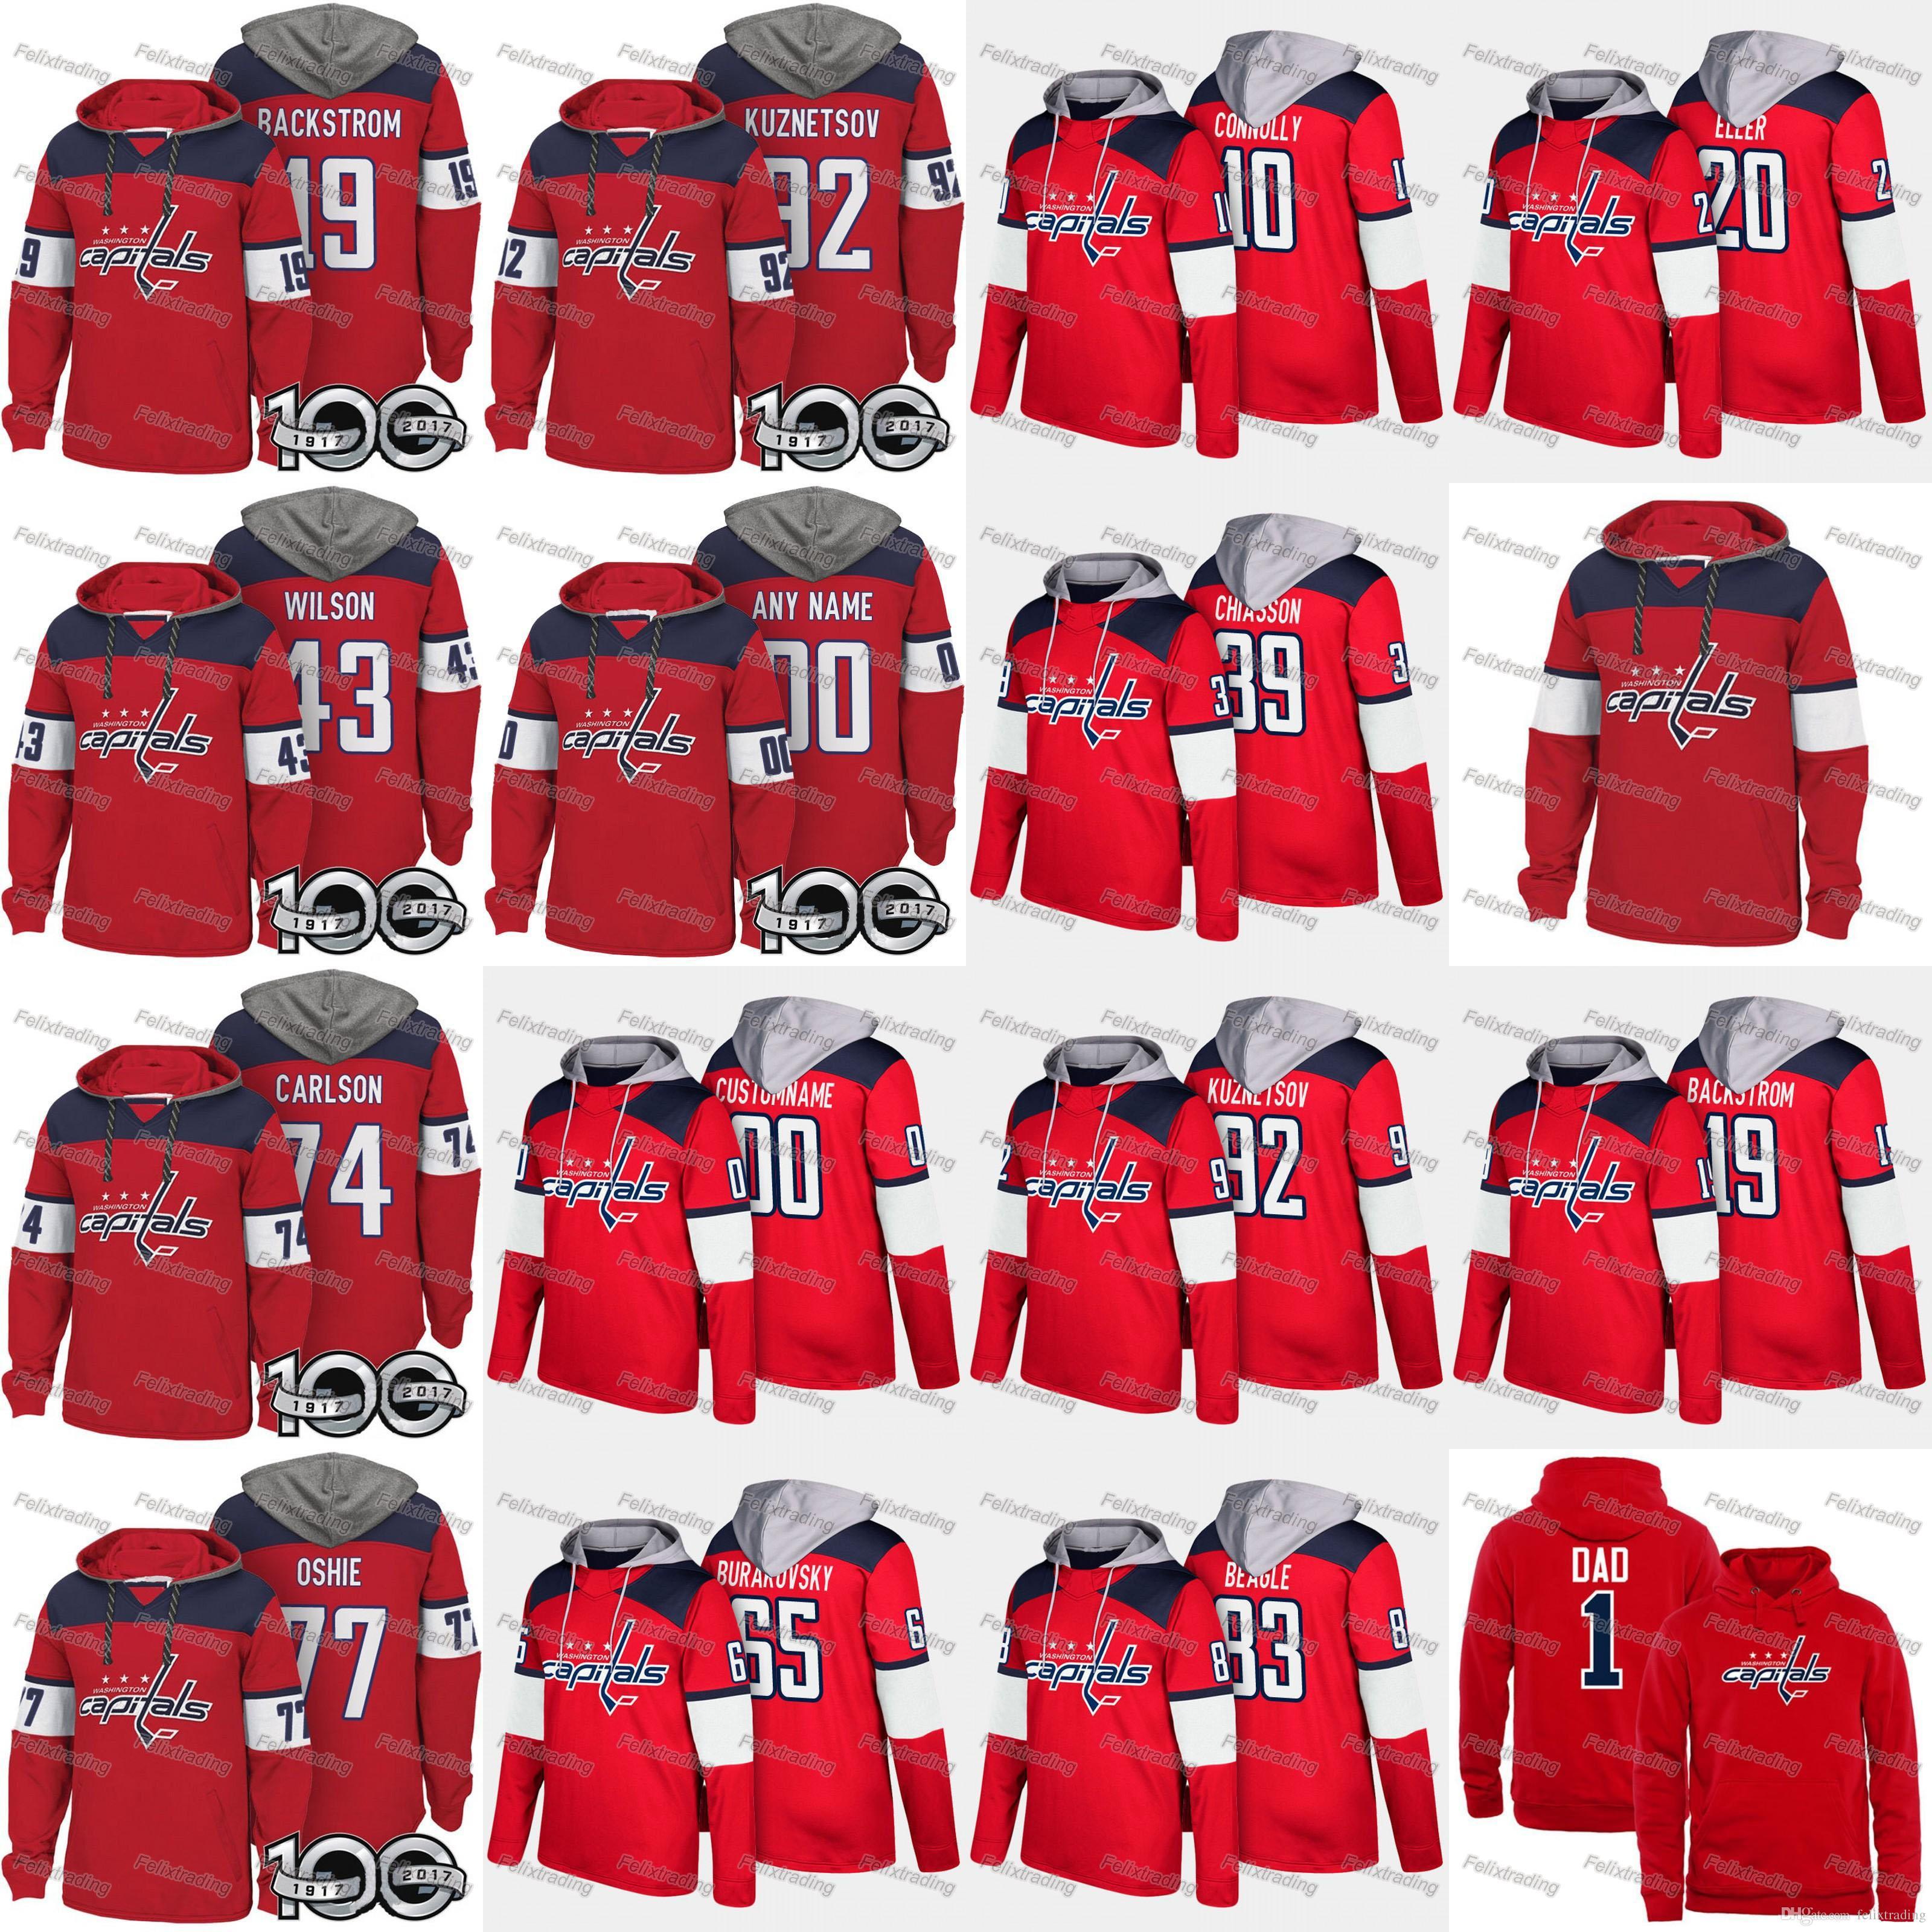 2019 Washington Capitals Hoodie 8 Alex Ovechkin Nicklas Backstrom 43 Tom  Wilson 77 T.J. Oshie 70 Braden Holtby 92 Evgeny Kuznetsov Hockey Hoodies  From ... 0d9d47d69